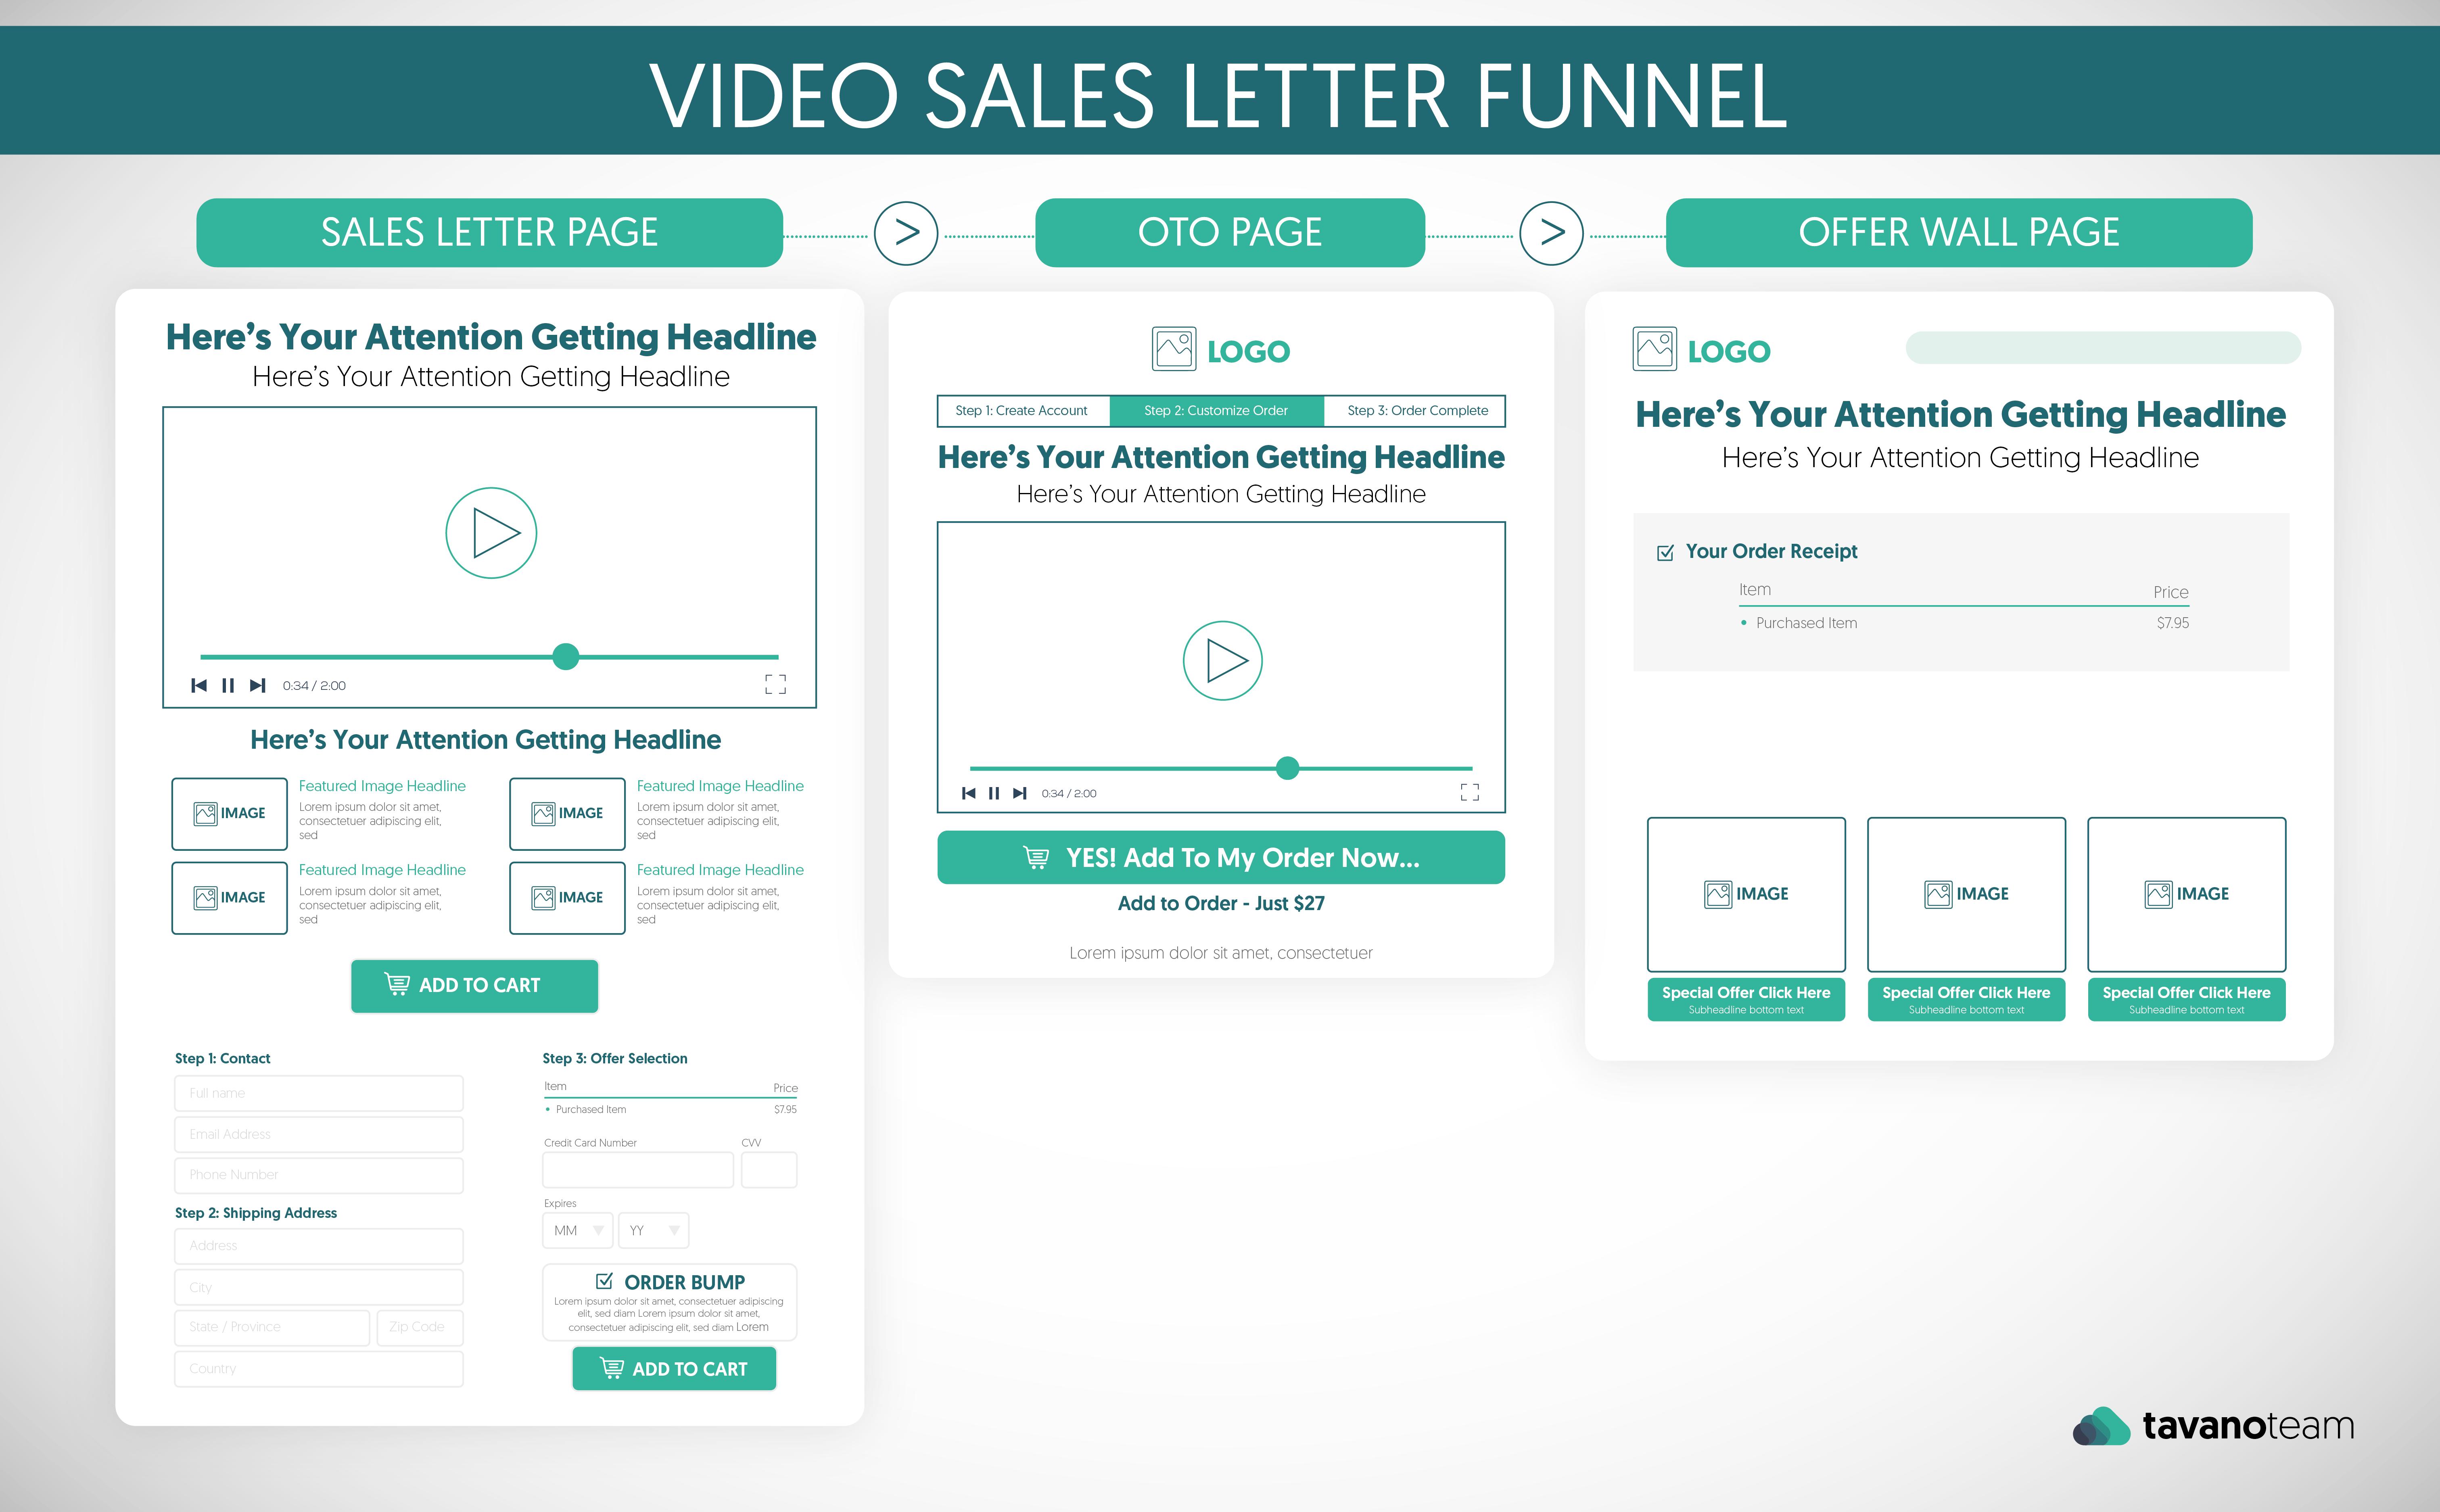 video sales leter funnel suitecommerce advanced tavano team netsuite